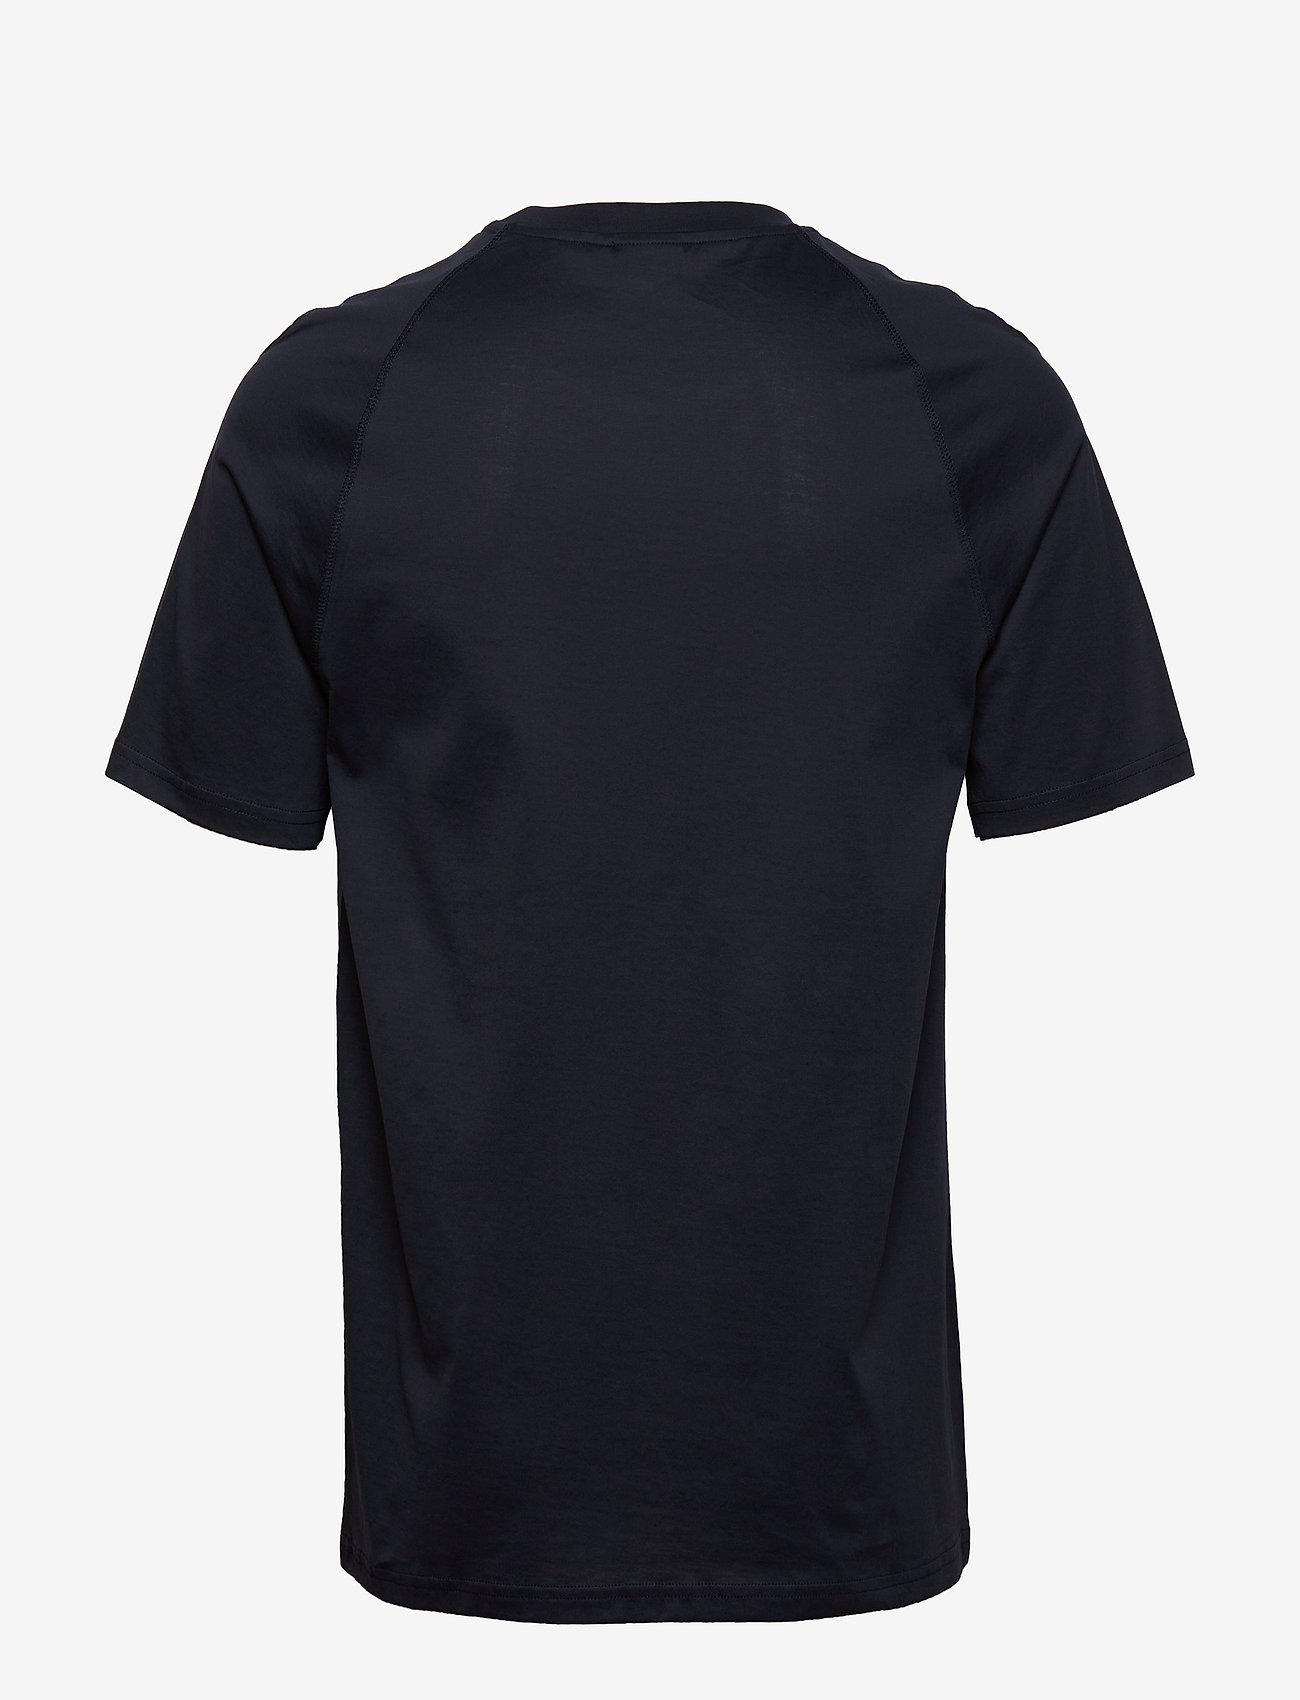 J. Lindeberg - Jordan Bridge t-shirt cotton - basic t-shirts - jl navy - 1